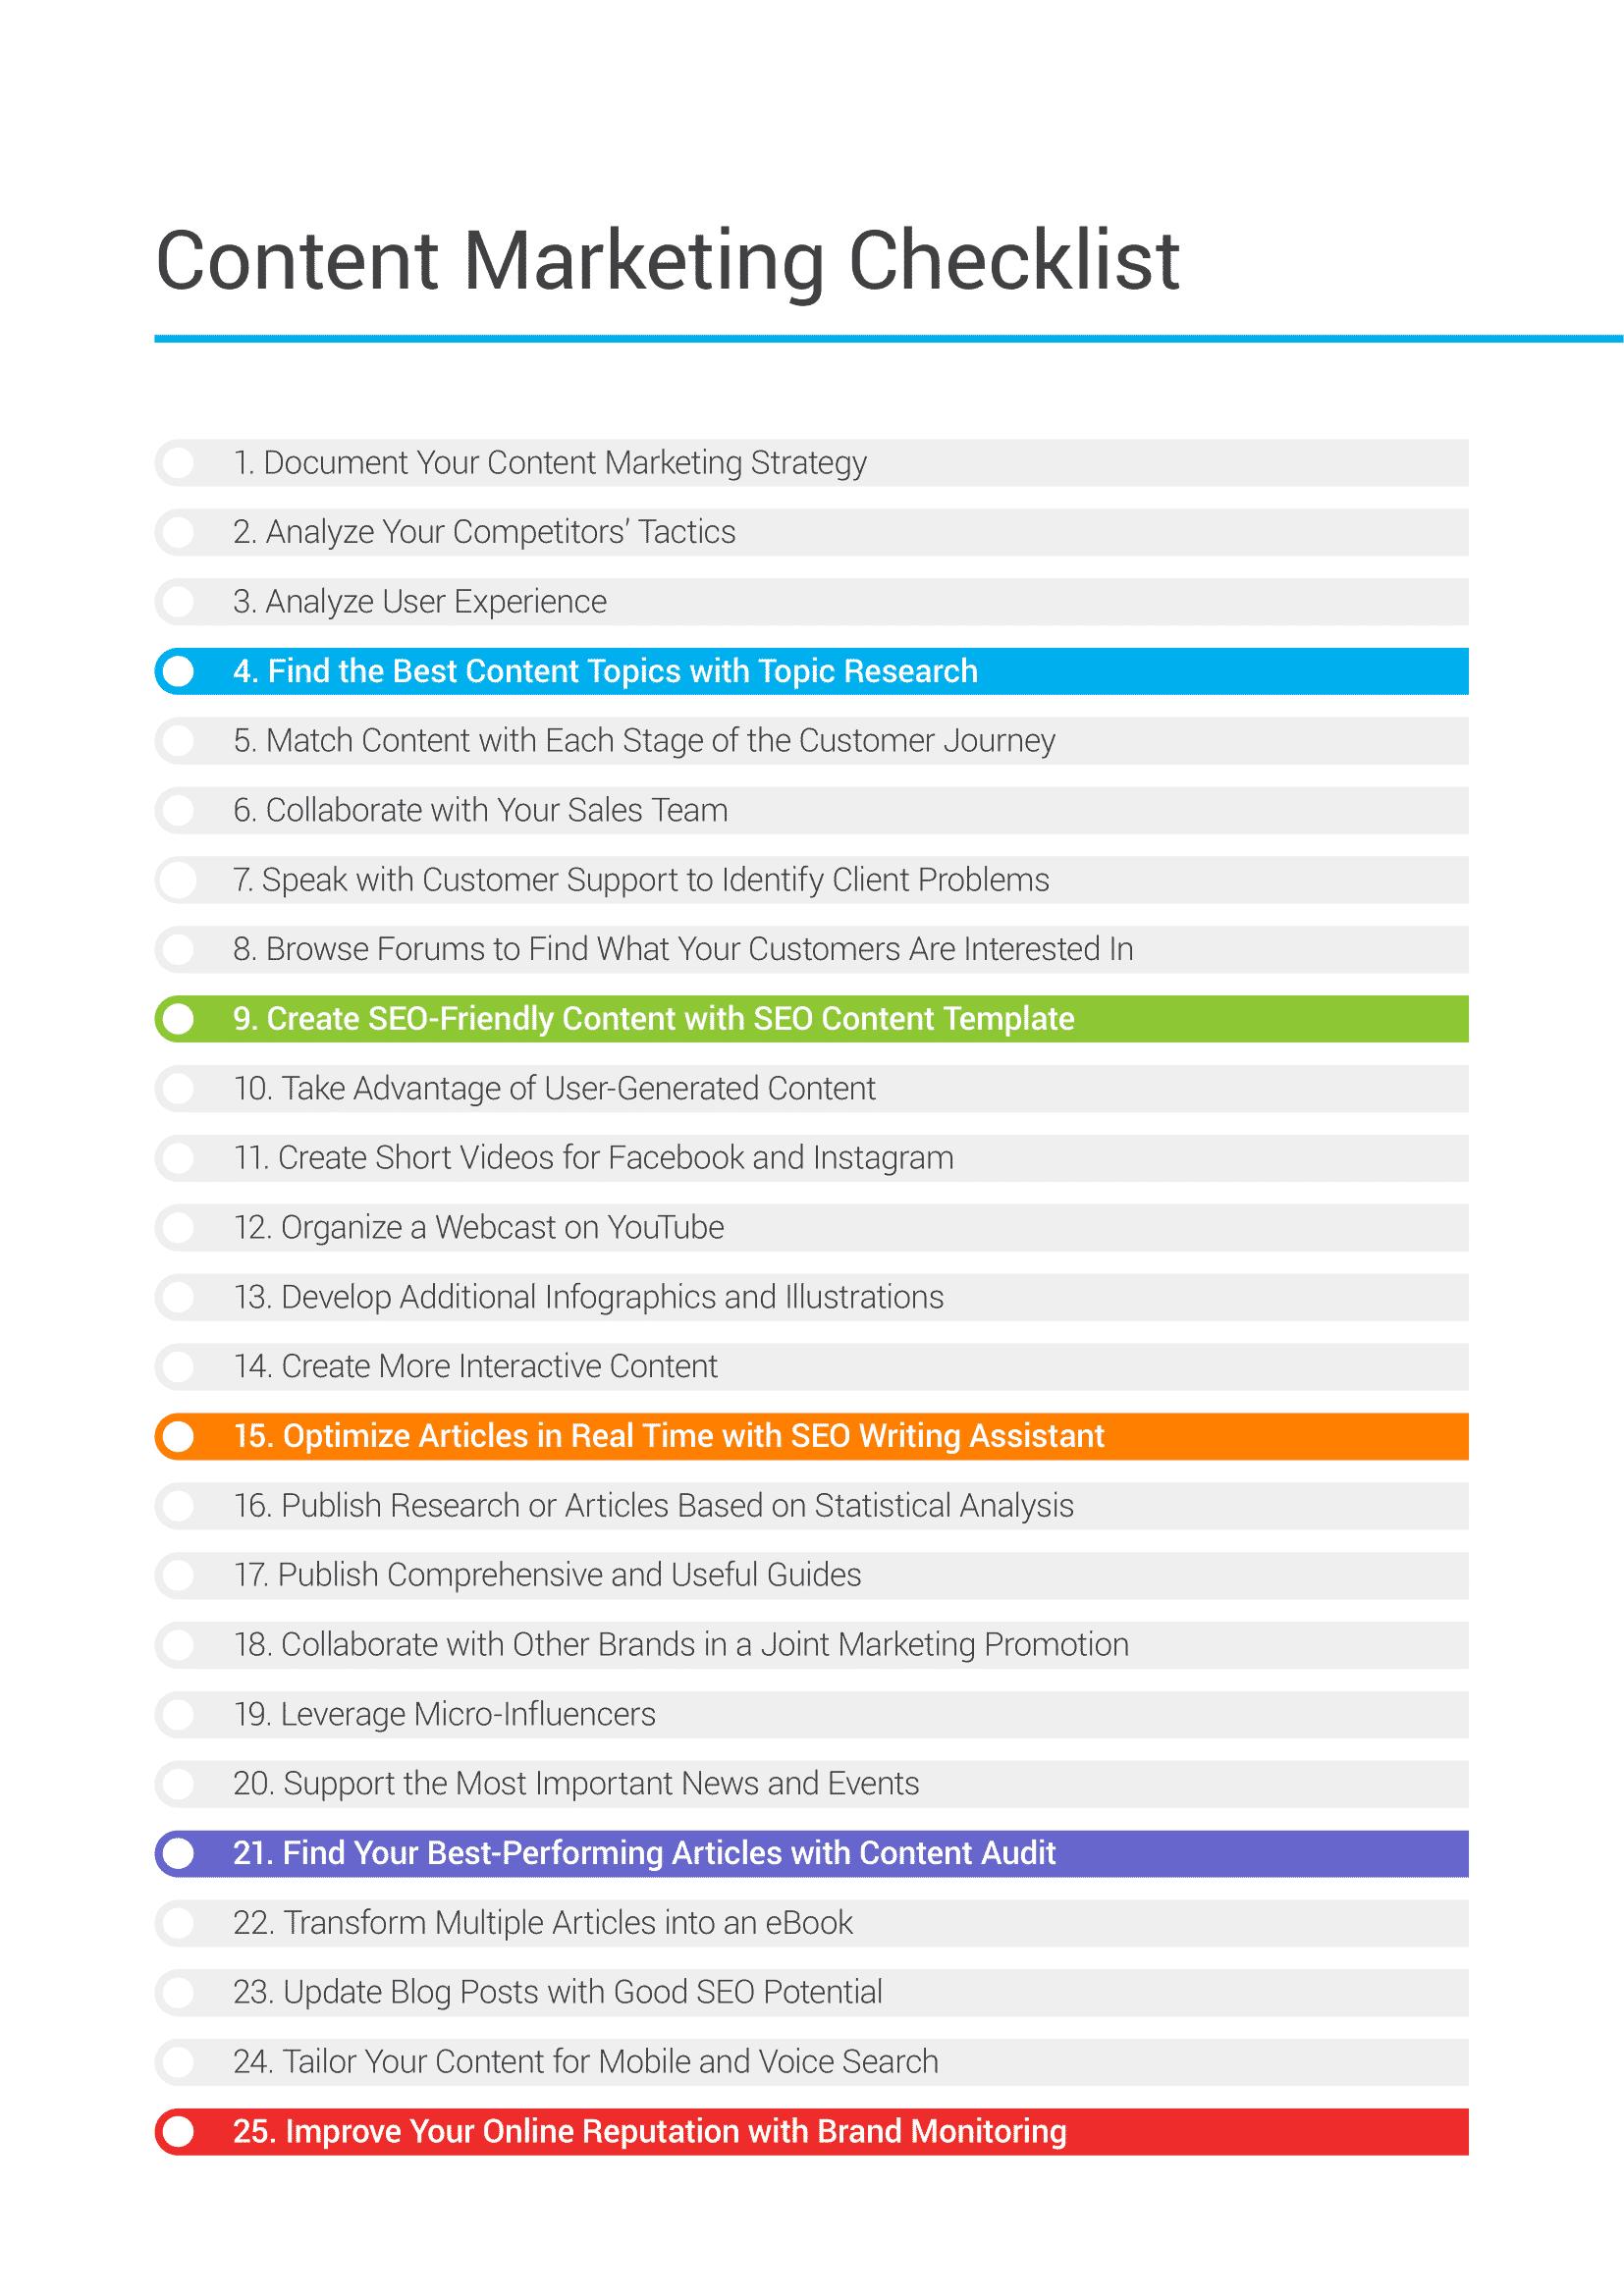 Content Marketing Checklist Infographic